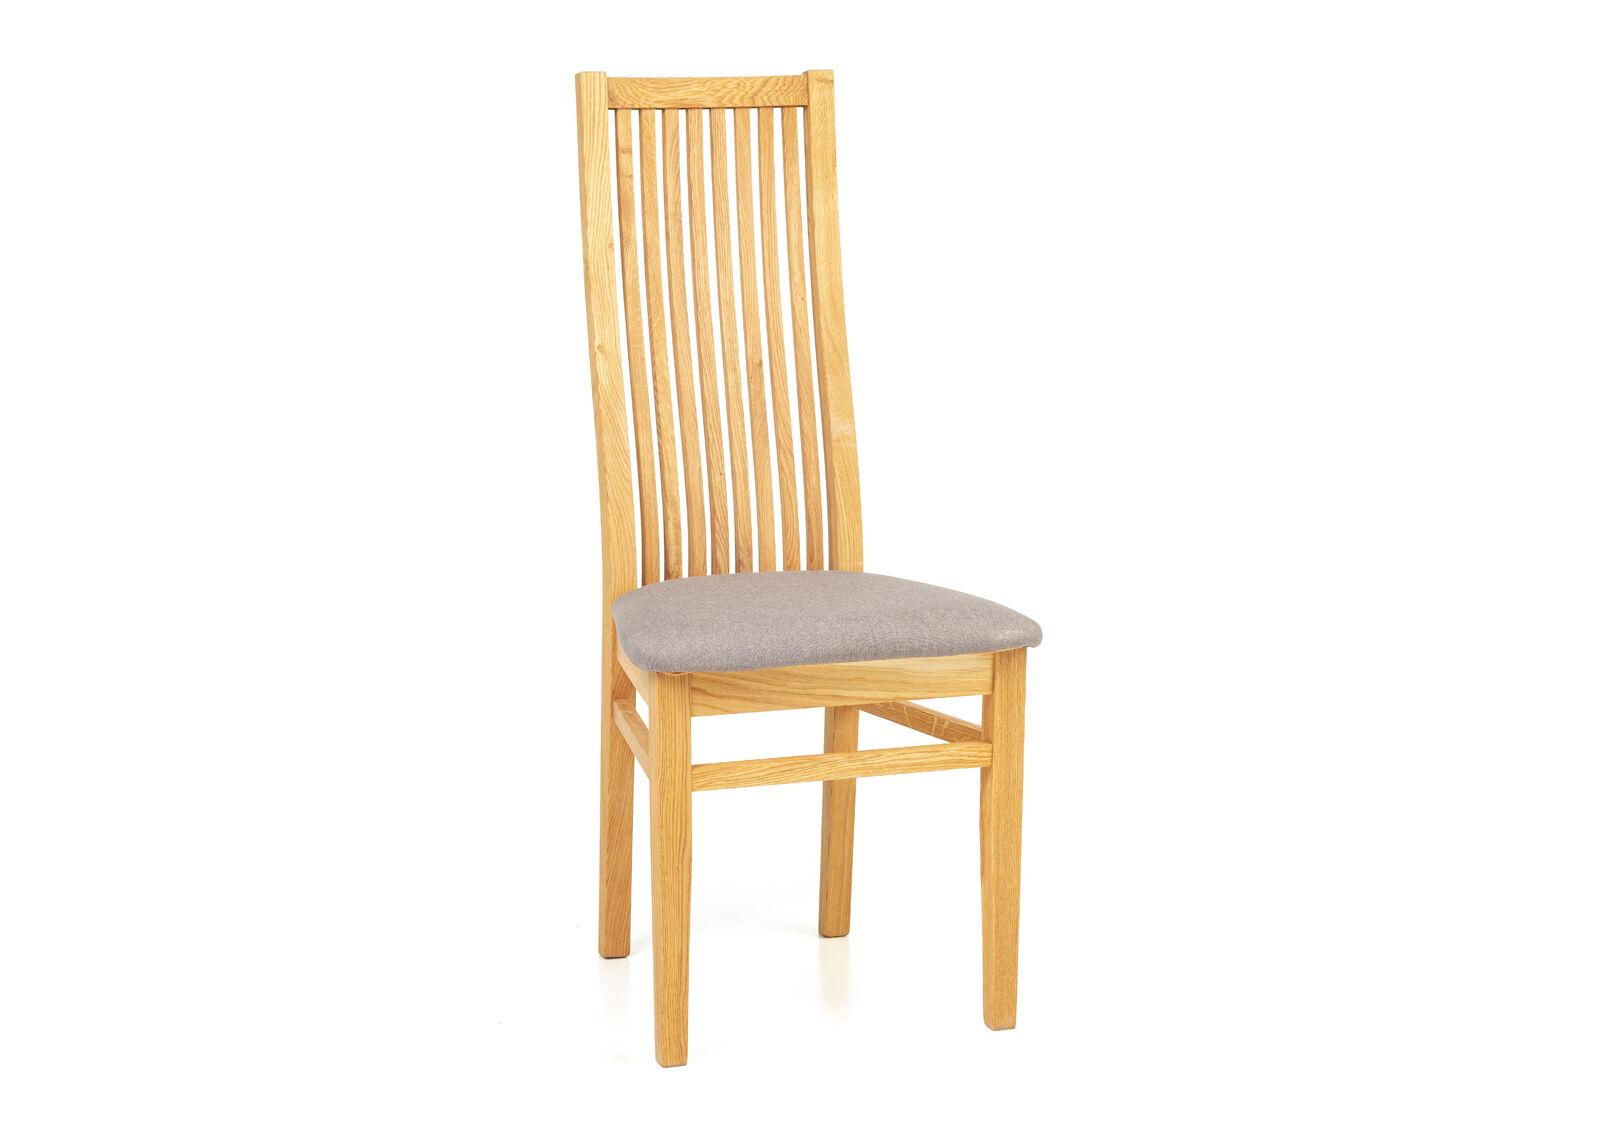 Lem Tammi ruokapöytä Lem 90x90 cm + 4 tuolia Sandra harmaa